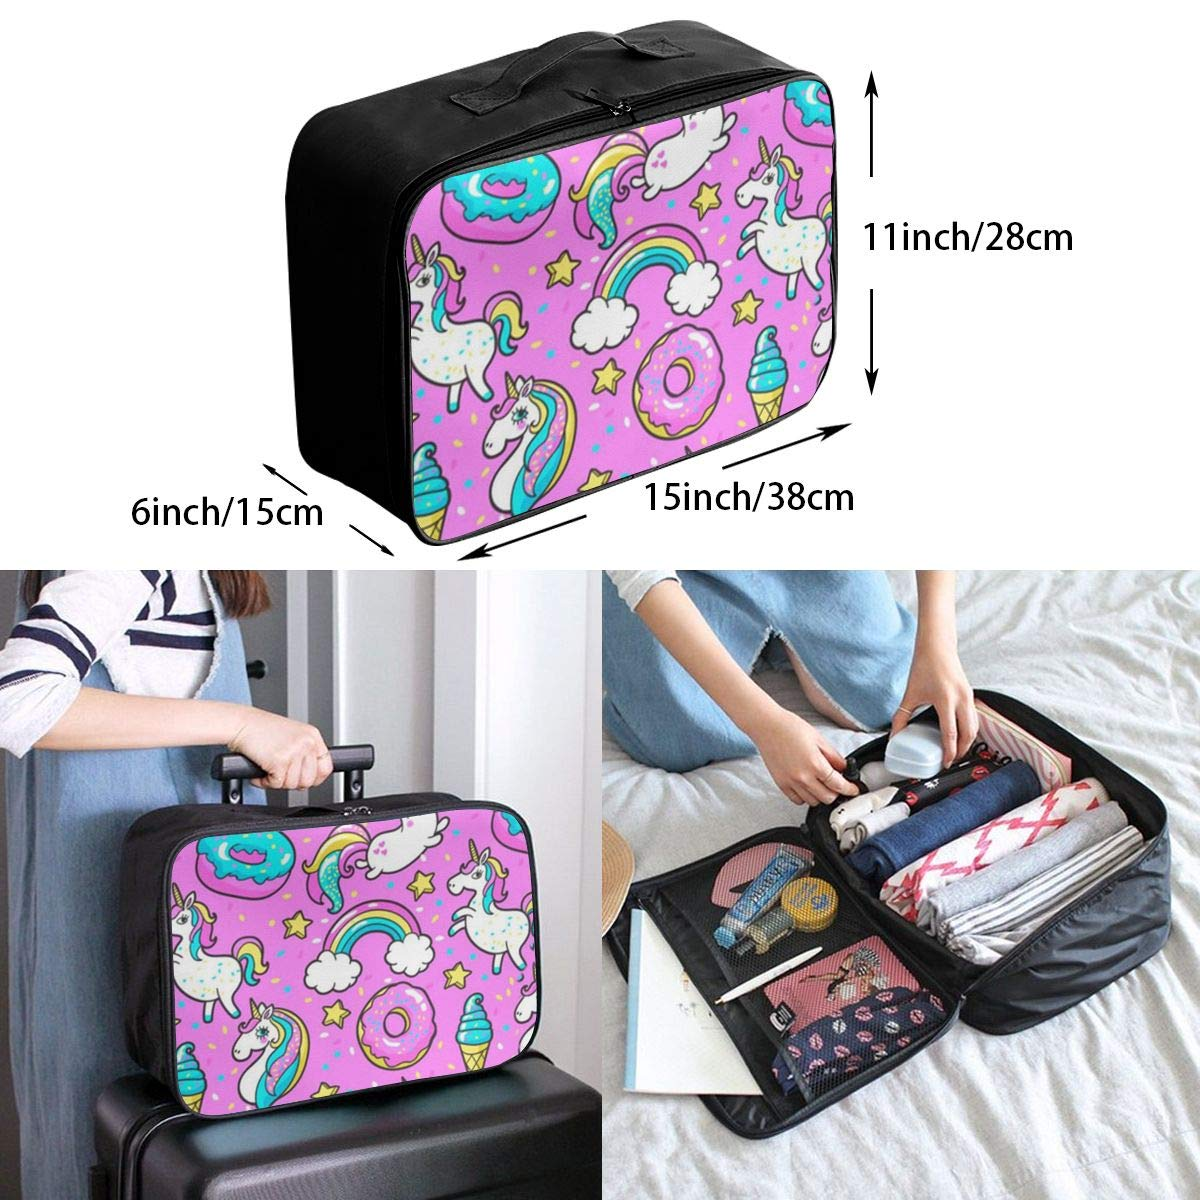 ADGAI Cute Unicorn Kawaii for Girls Canvas Travel Weekender Bag,Fashion Custom Lightweight Large Capacity Portable Luggage Bag,Suitcase Trolley Bag